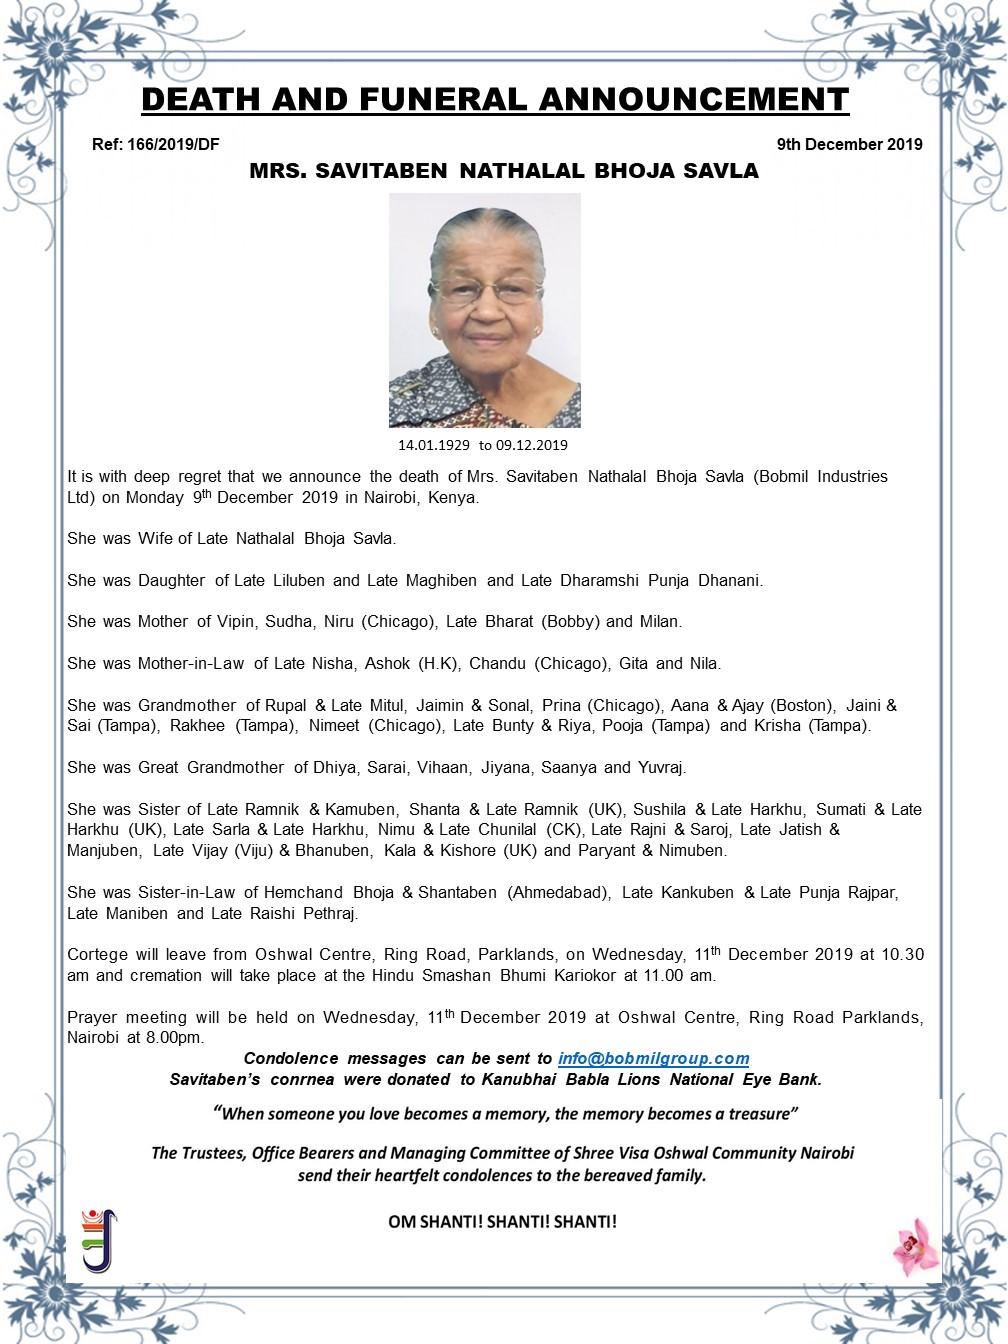 Savitaben Nathalal Bhoja Savla obituary